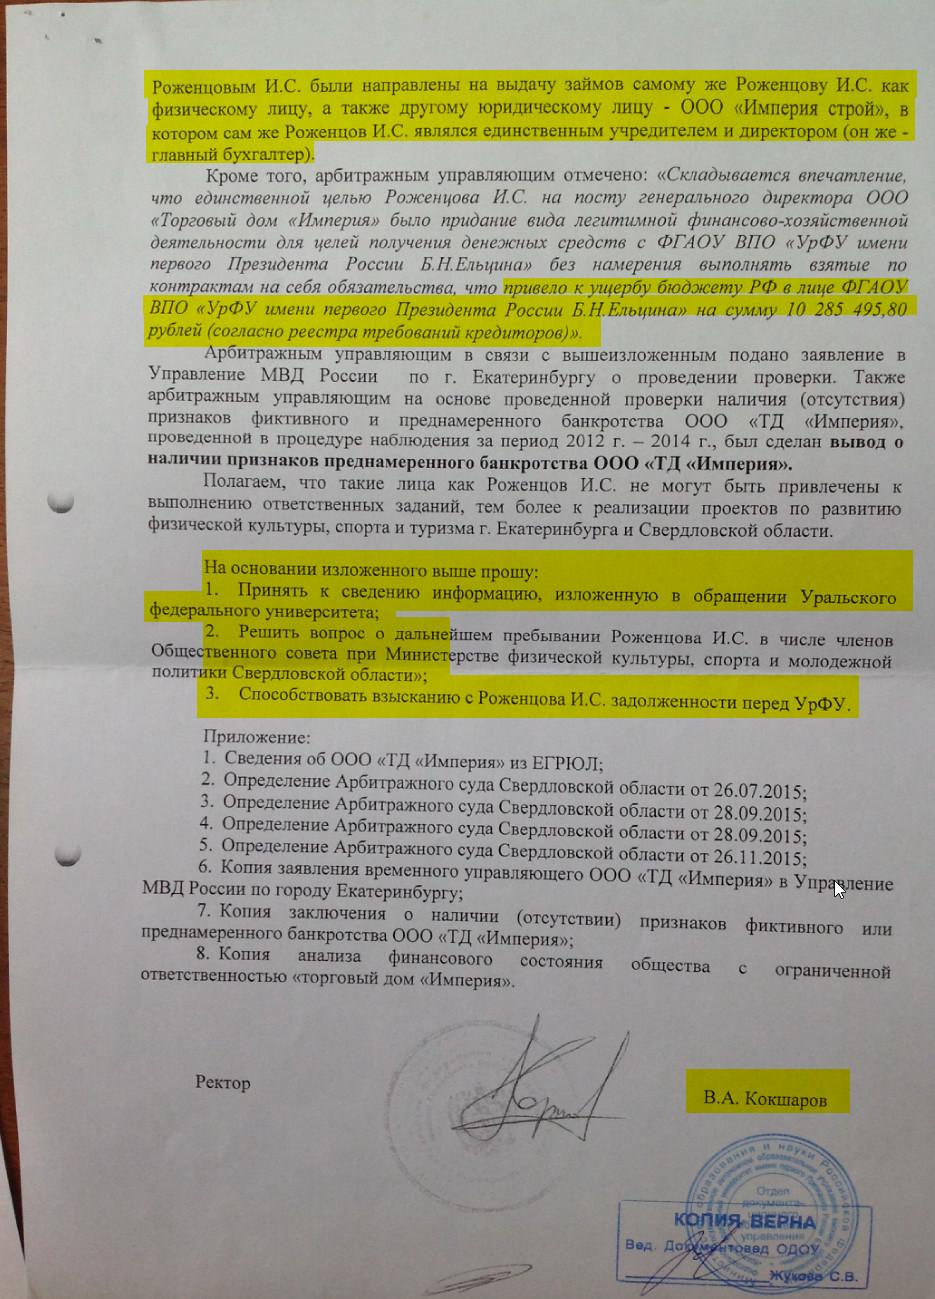 УрФУ Роженцов Буштрук Маматов Финмониторинг Интерпол 3